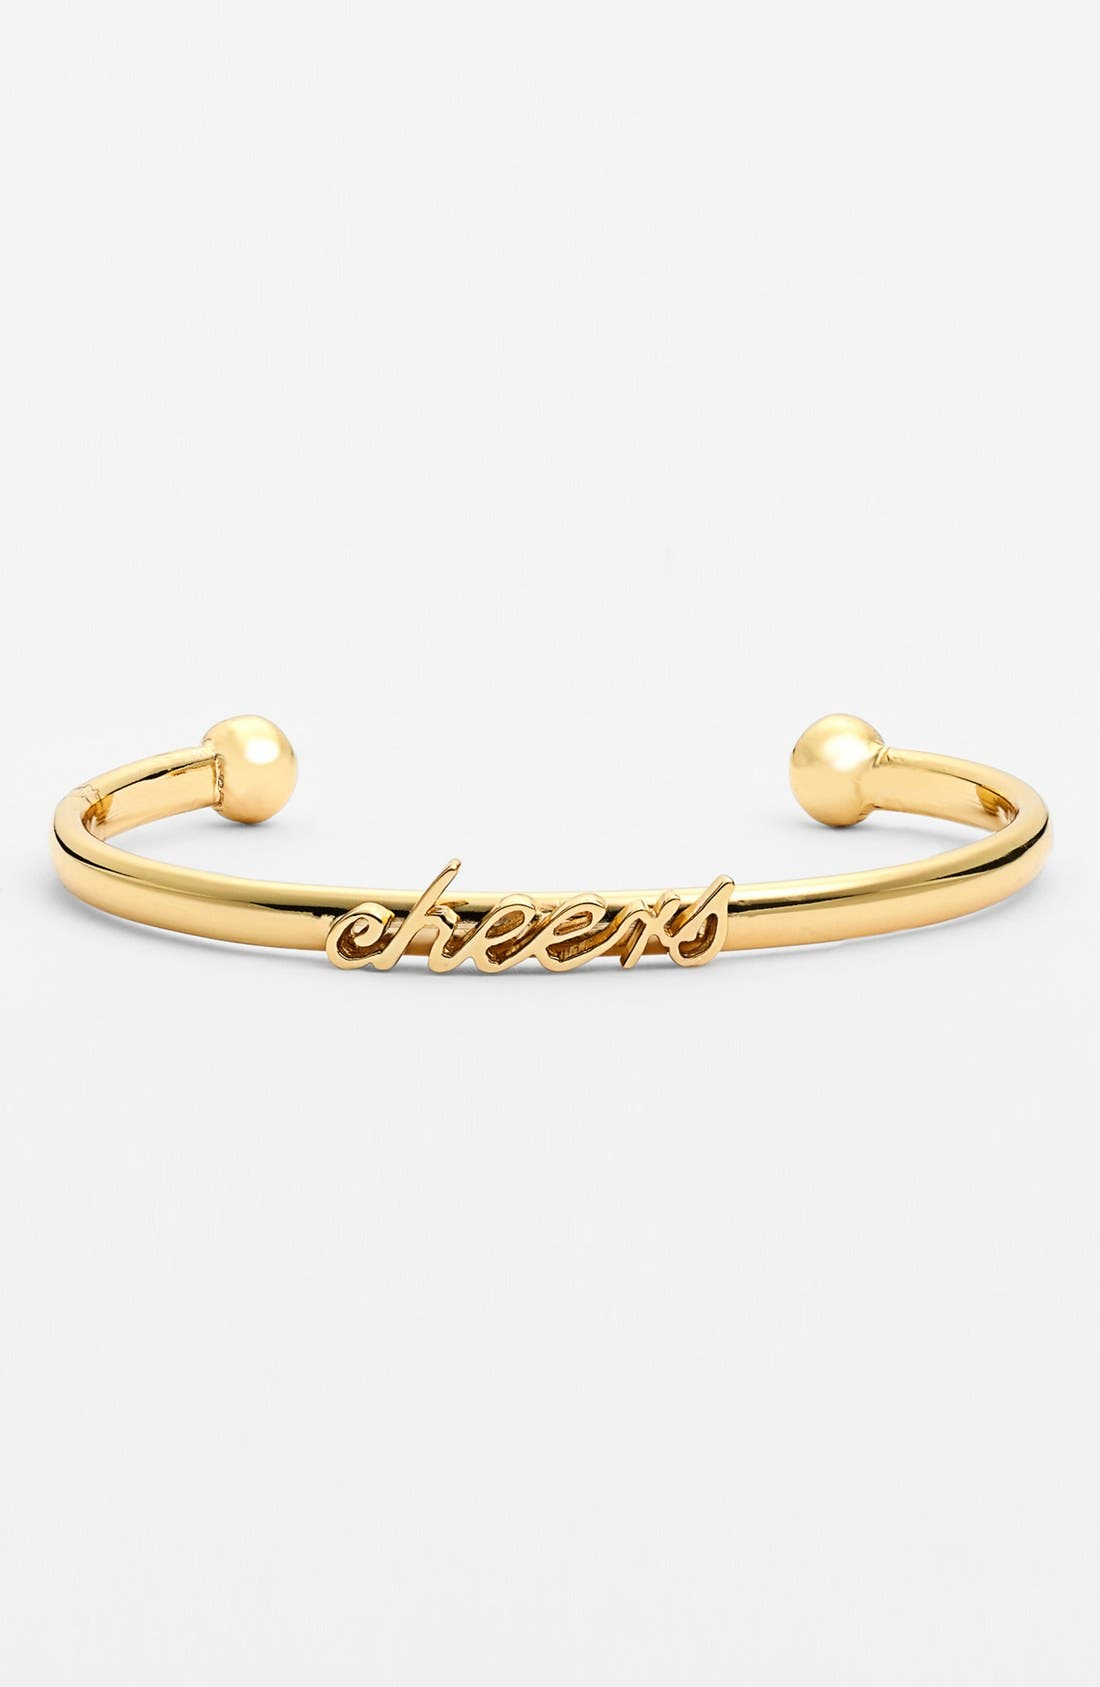 Main Image - kate spade new york 'cheers' script cuff bracelet